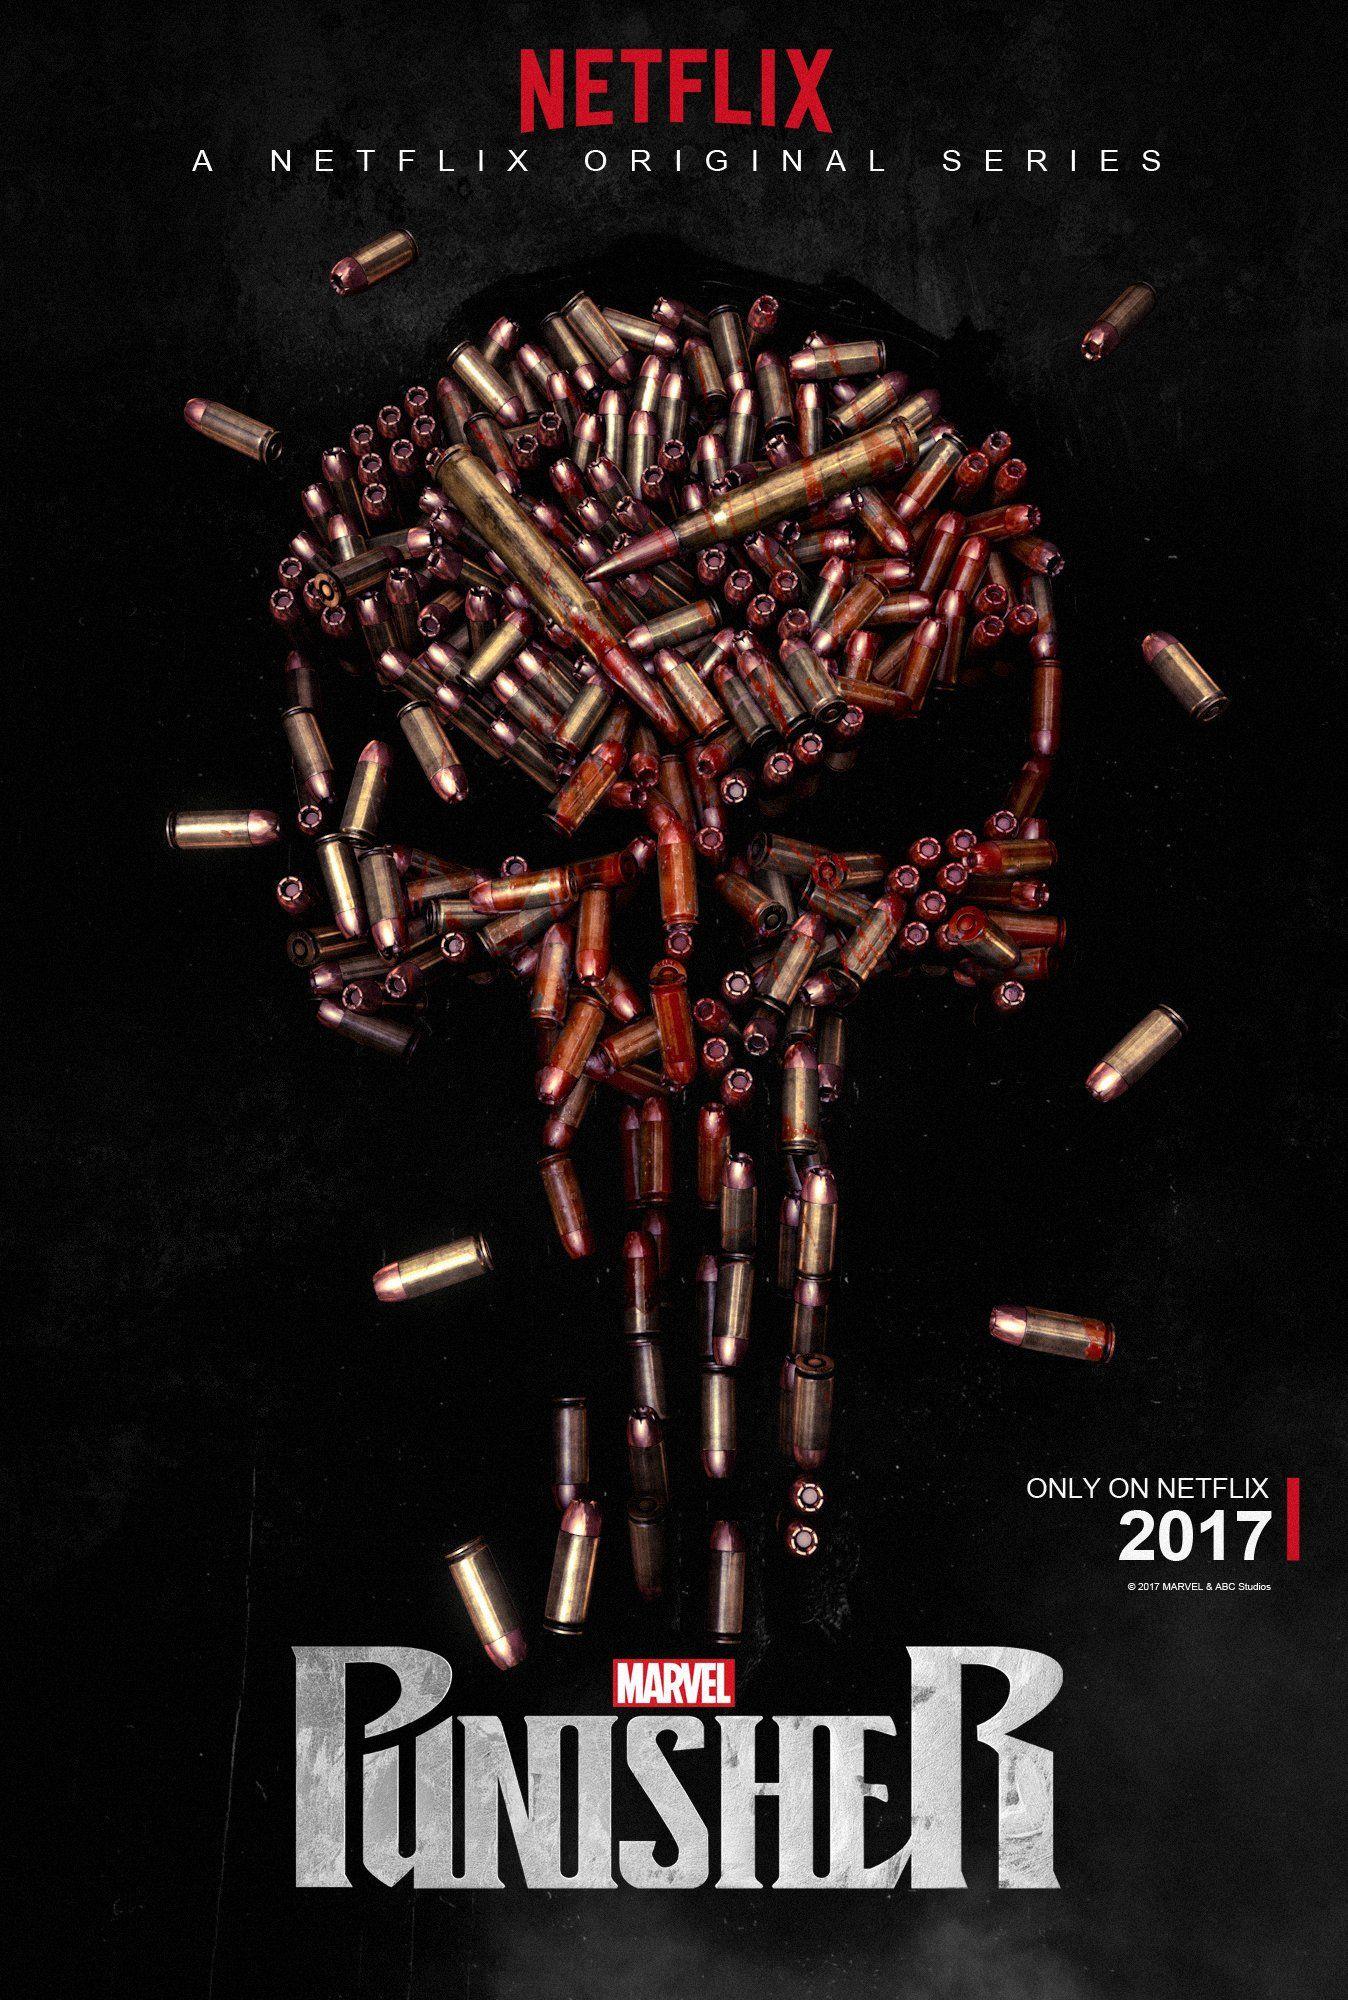 Amazing Wallpaper Marvel Punisher - dc8513317defb020d4c351984796d67a  Image_4857.jpg